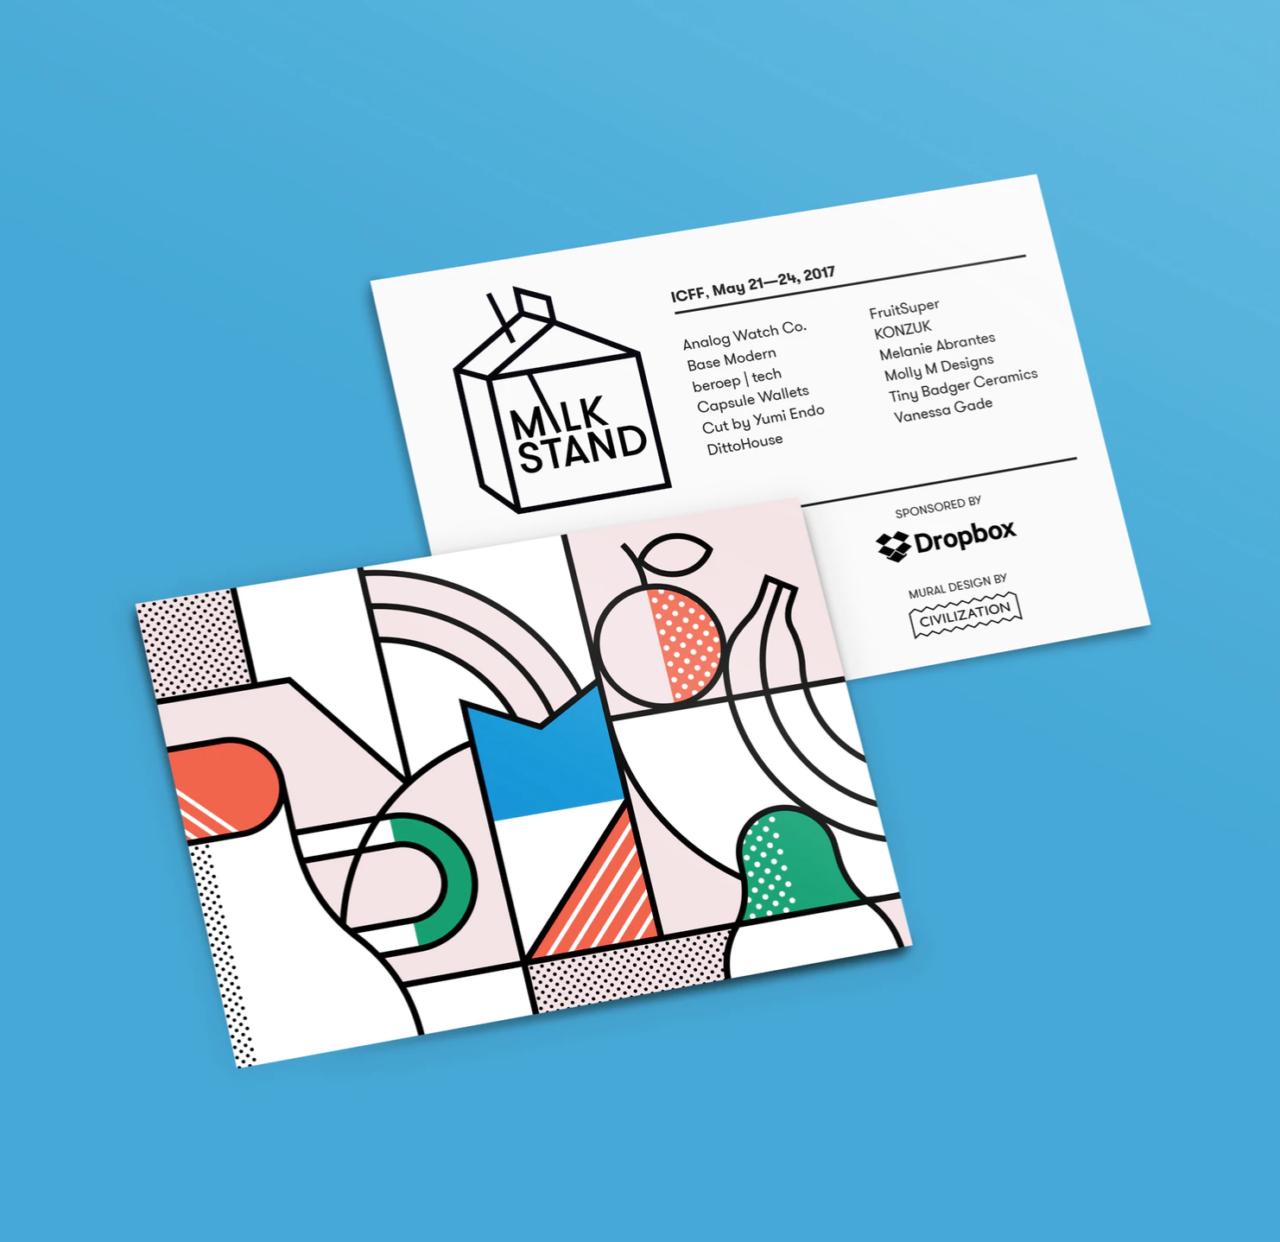 Design Milk at NYCxDesign 2017